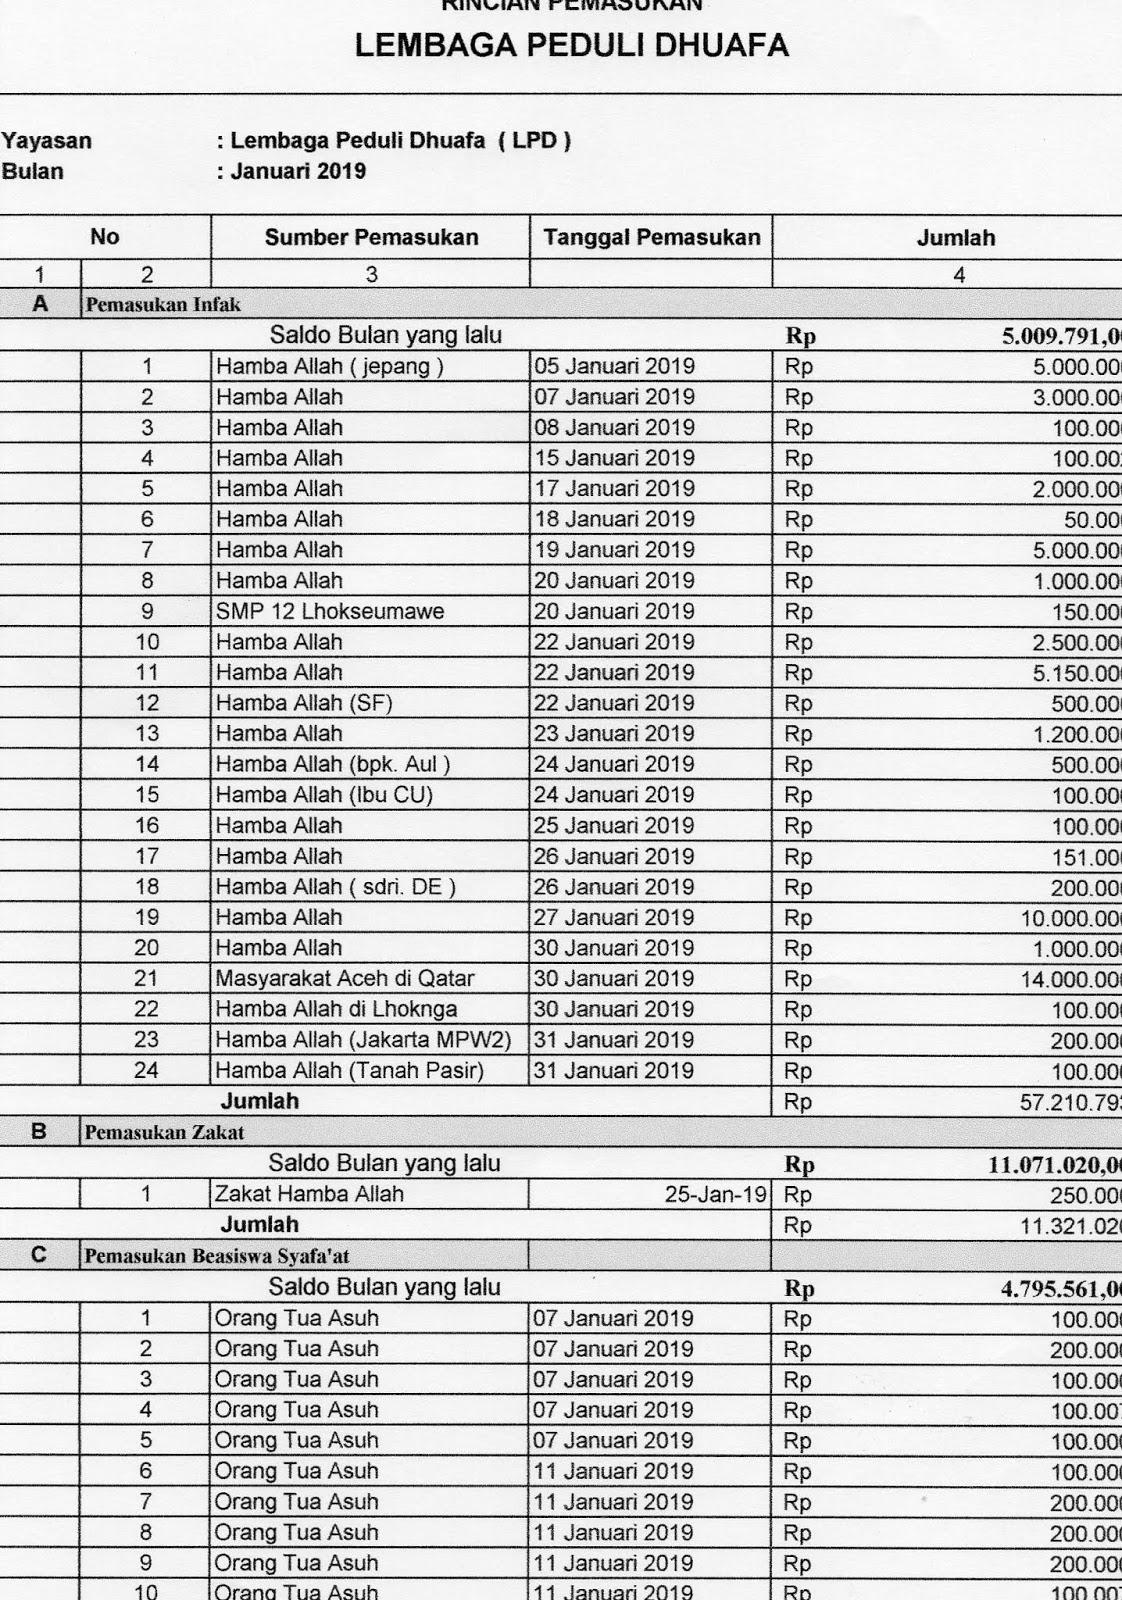 Laporan Keuangan Pemasukan Dan Pengeluaran